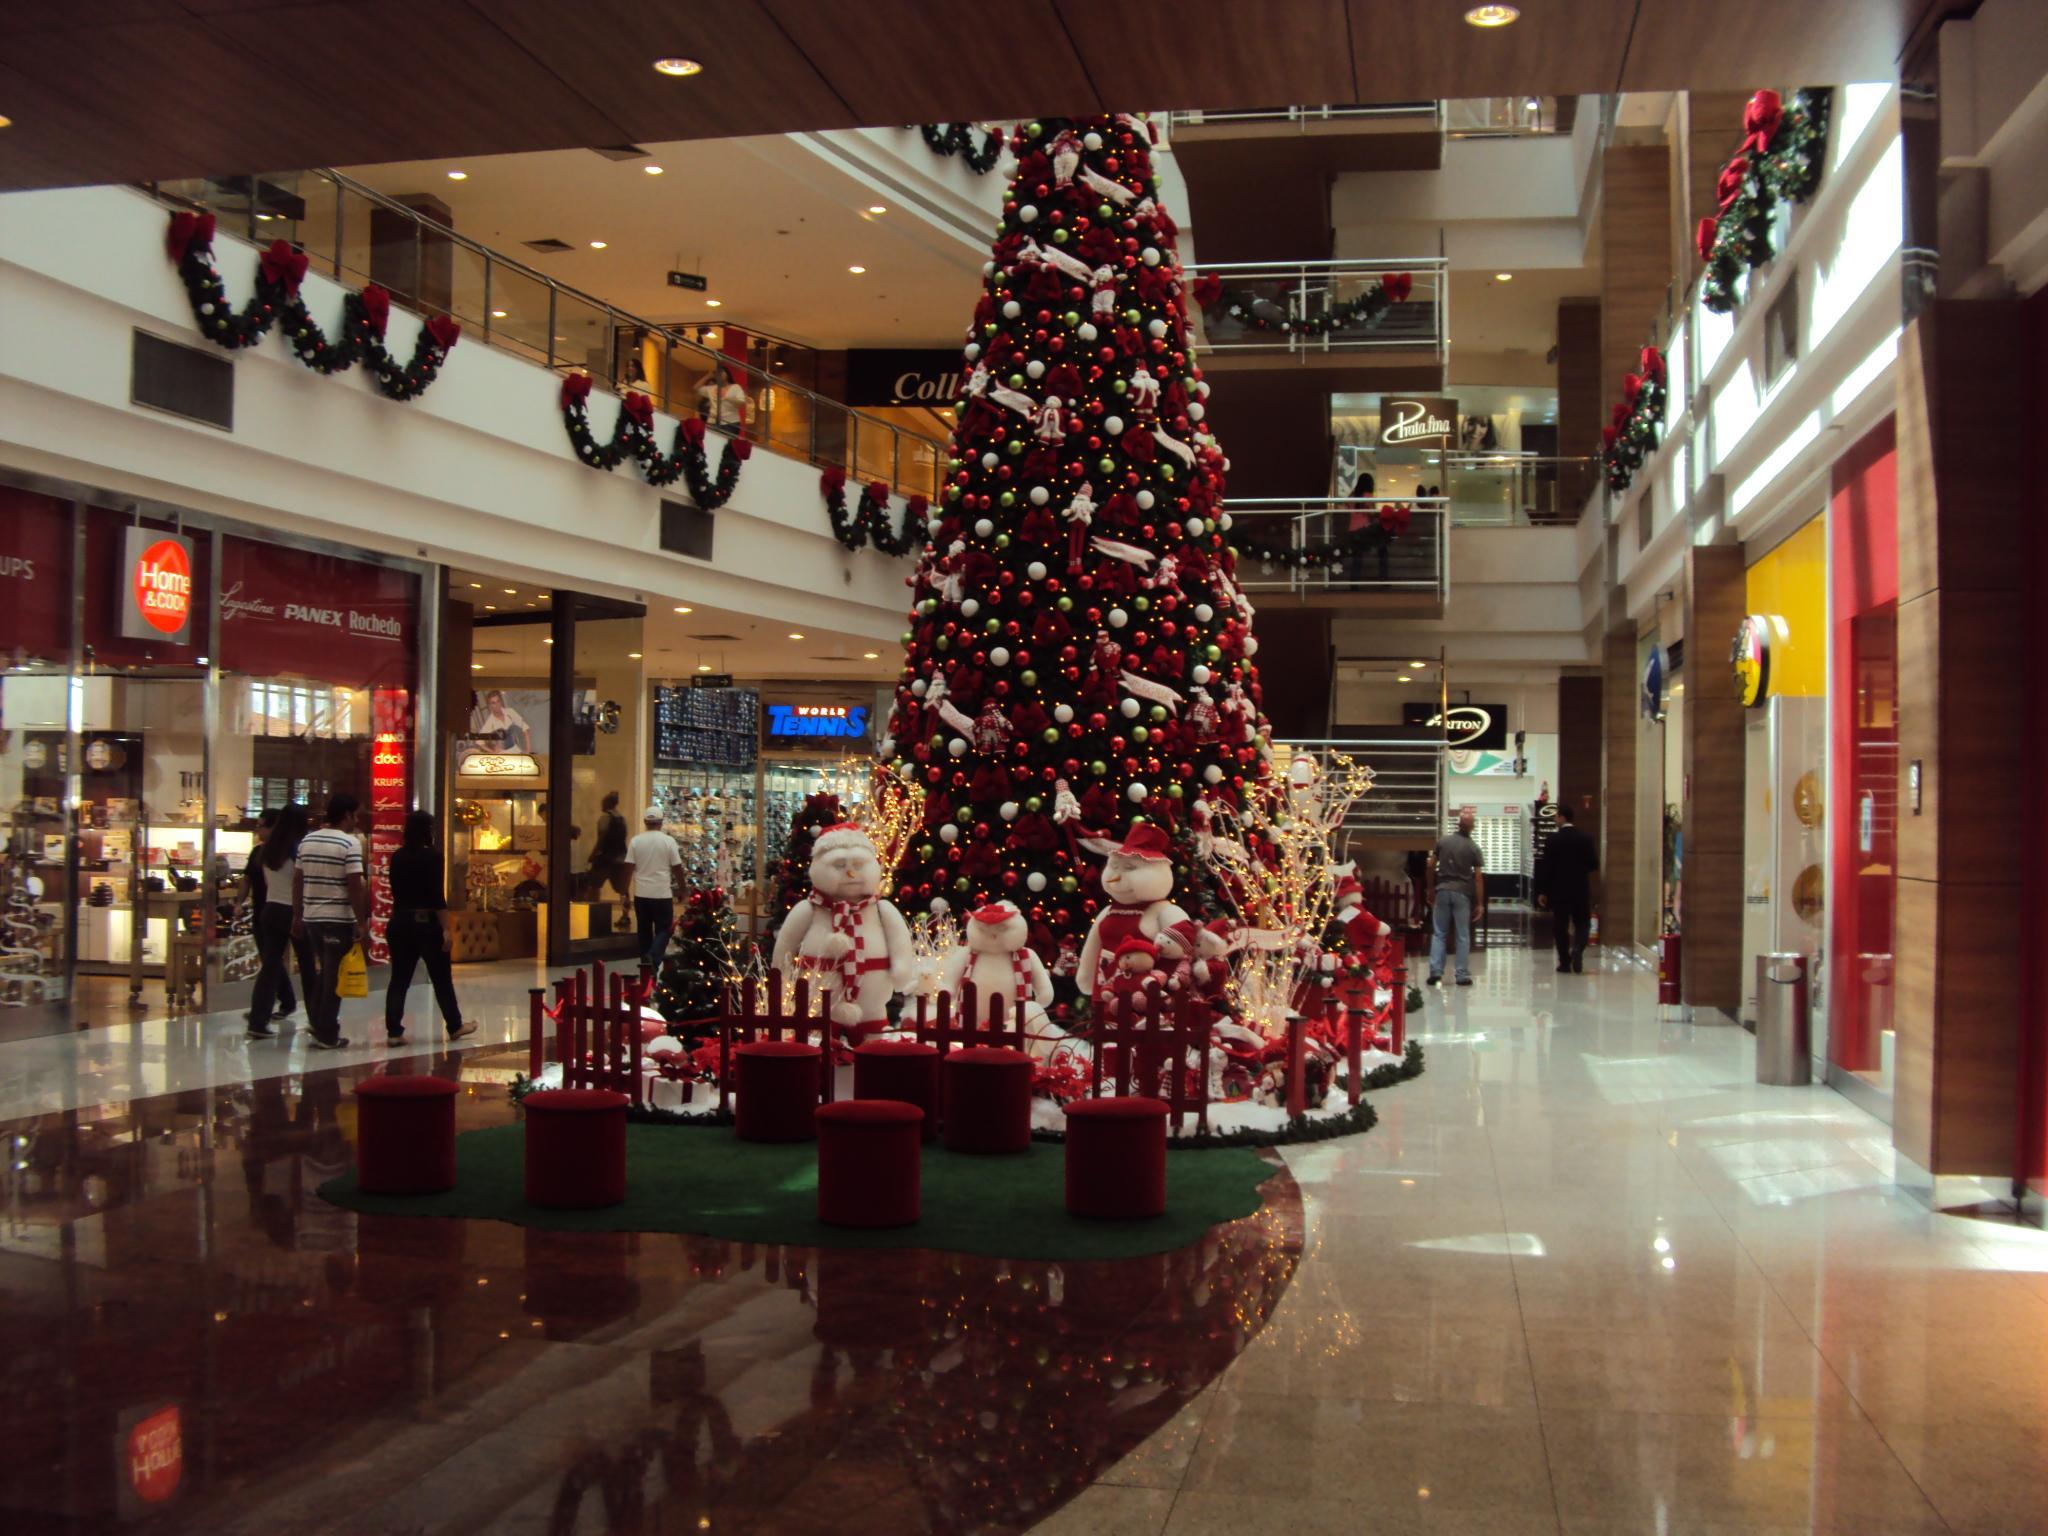 ficheiro decora o de natal shopping santa rsula jpg wikip dia a enciclop dia livre. Black Bedroom Furniture Sets. Home Design Ideas